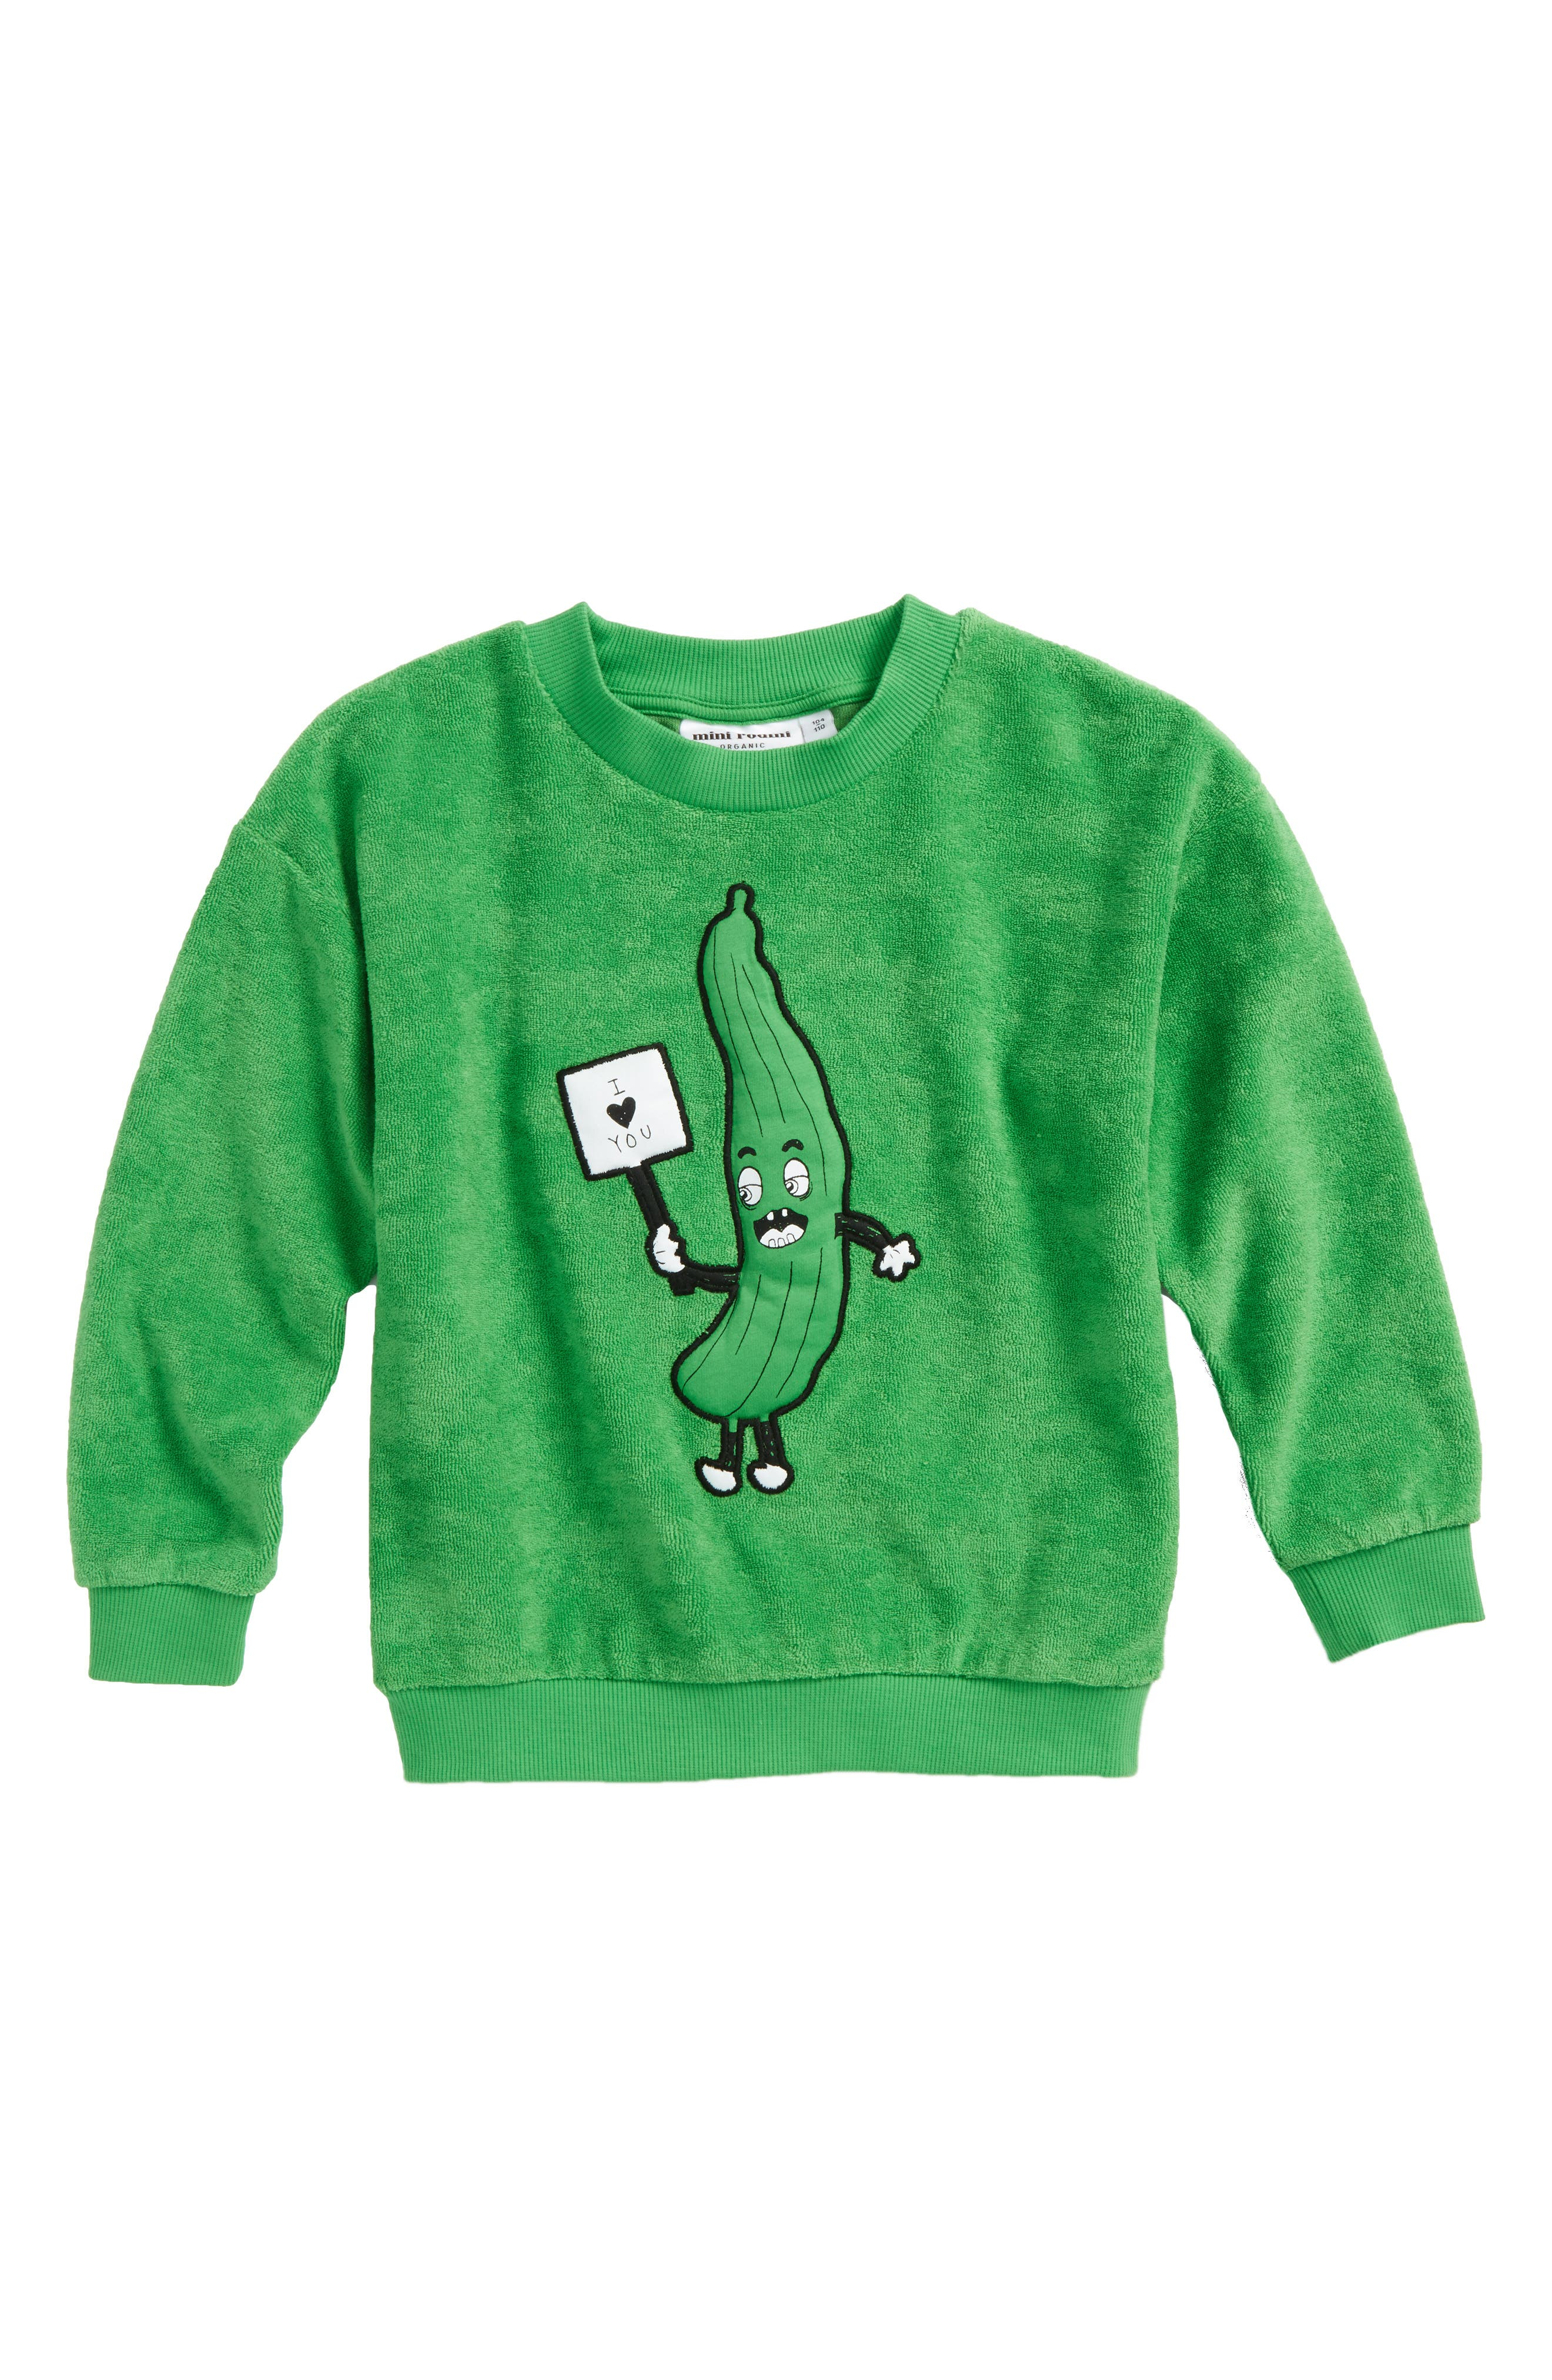 Cucumber Terry Sweatshirt,                         Main,                         color, 300